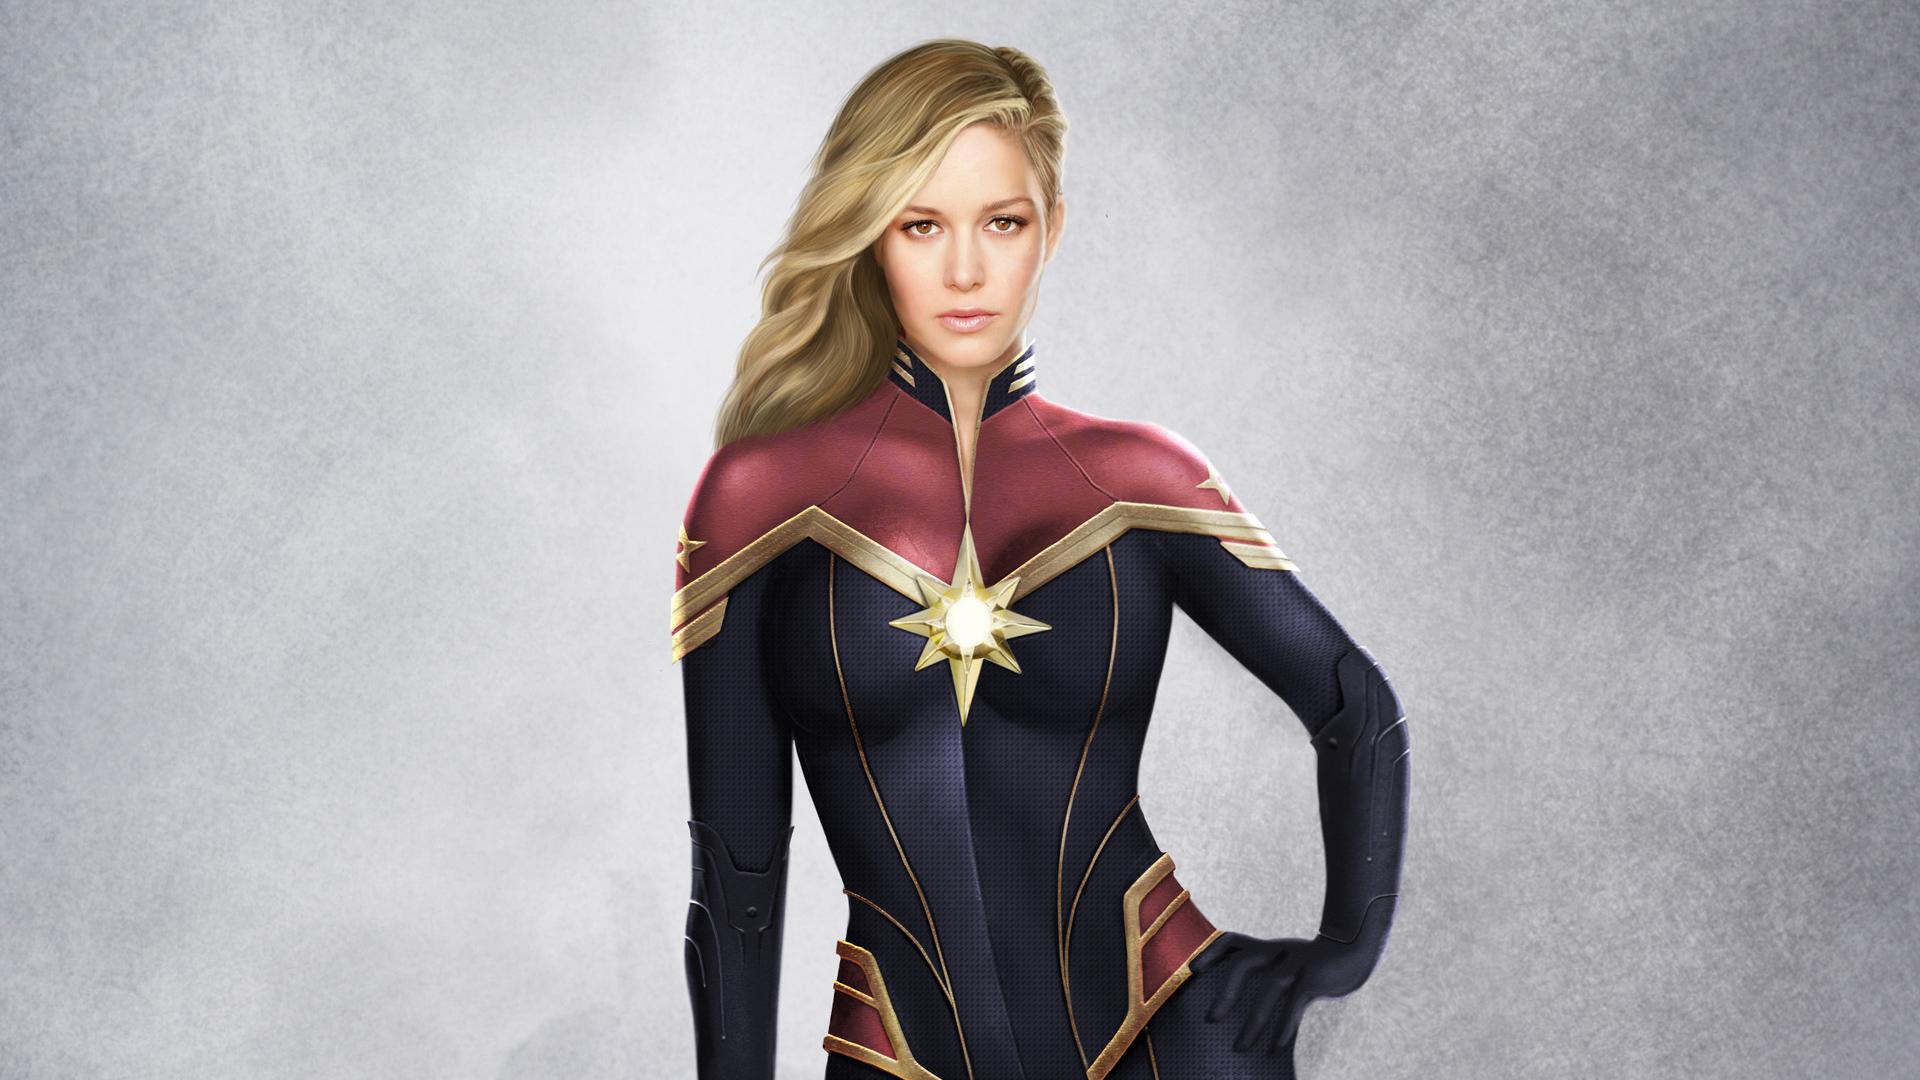 Captain Marvel Artwork 2019, HD Movies, 4k Wallpapers ...